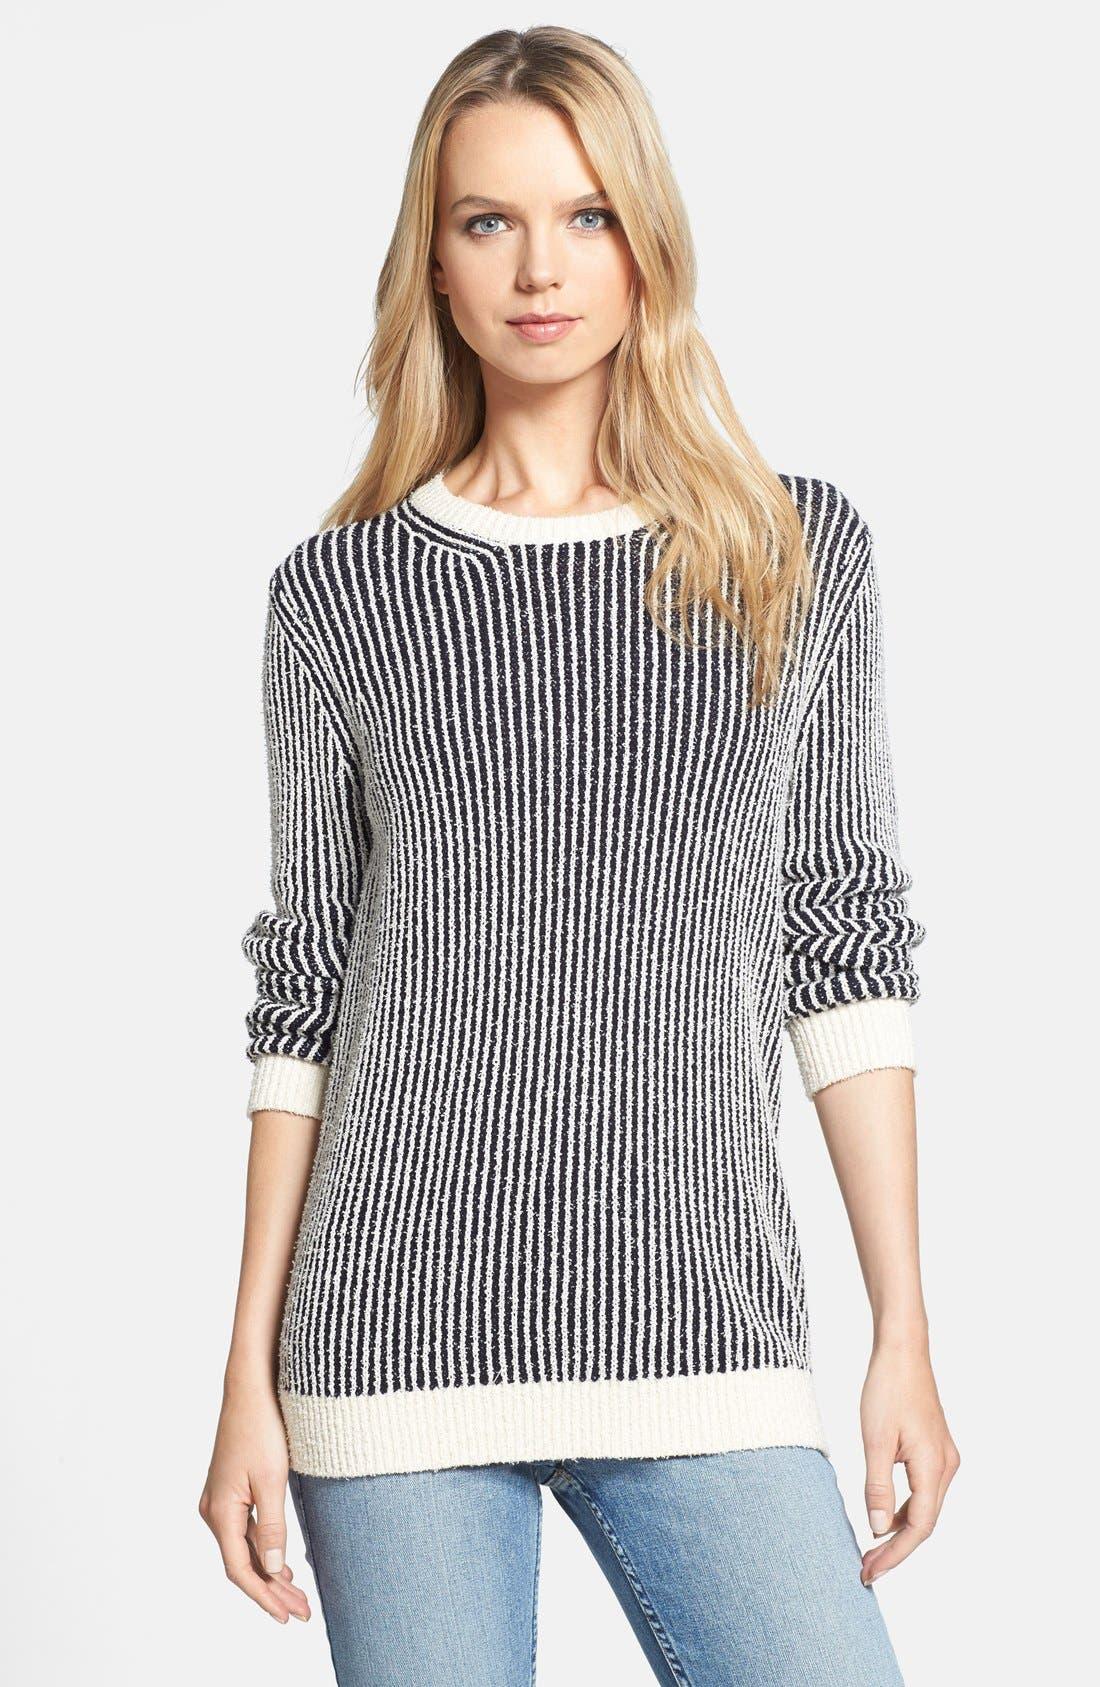 Alternate Image 1 Selected - Theory 'Jaidyn SN' Textured Stripe Sweater